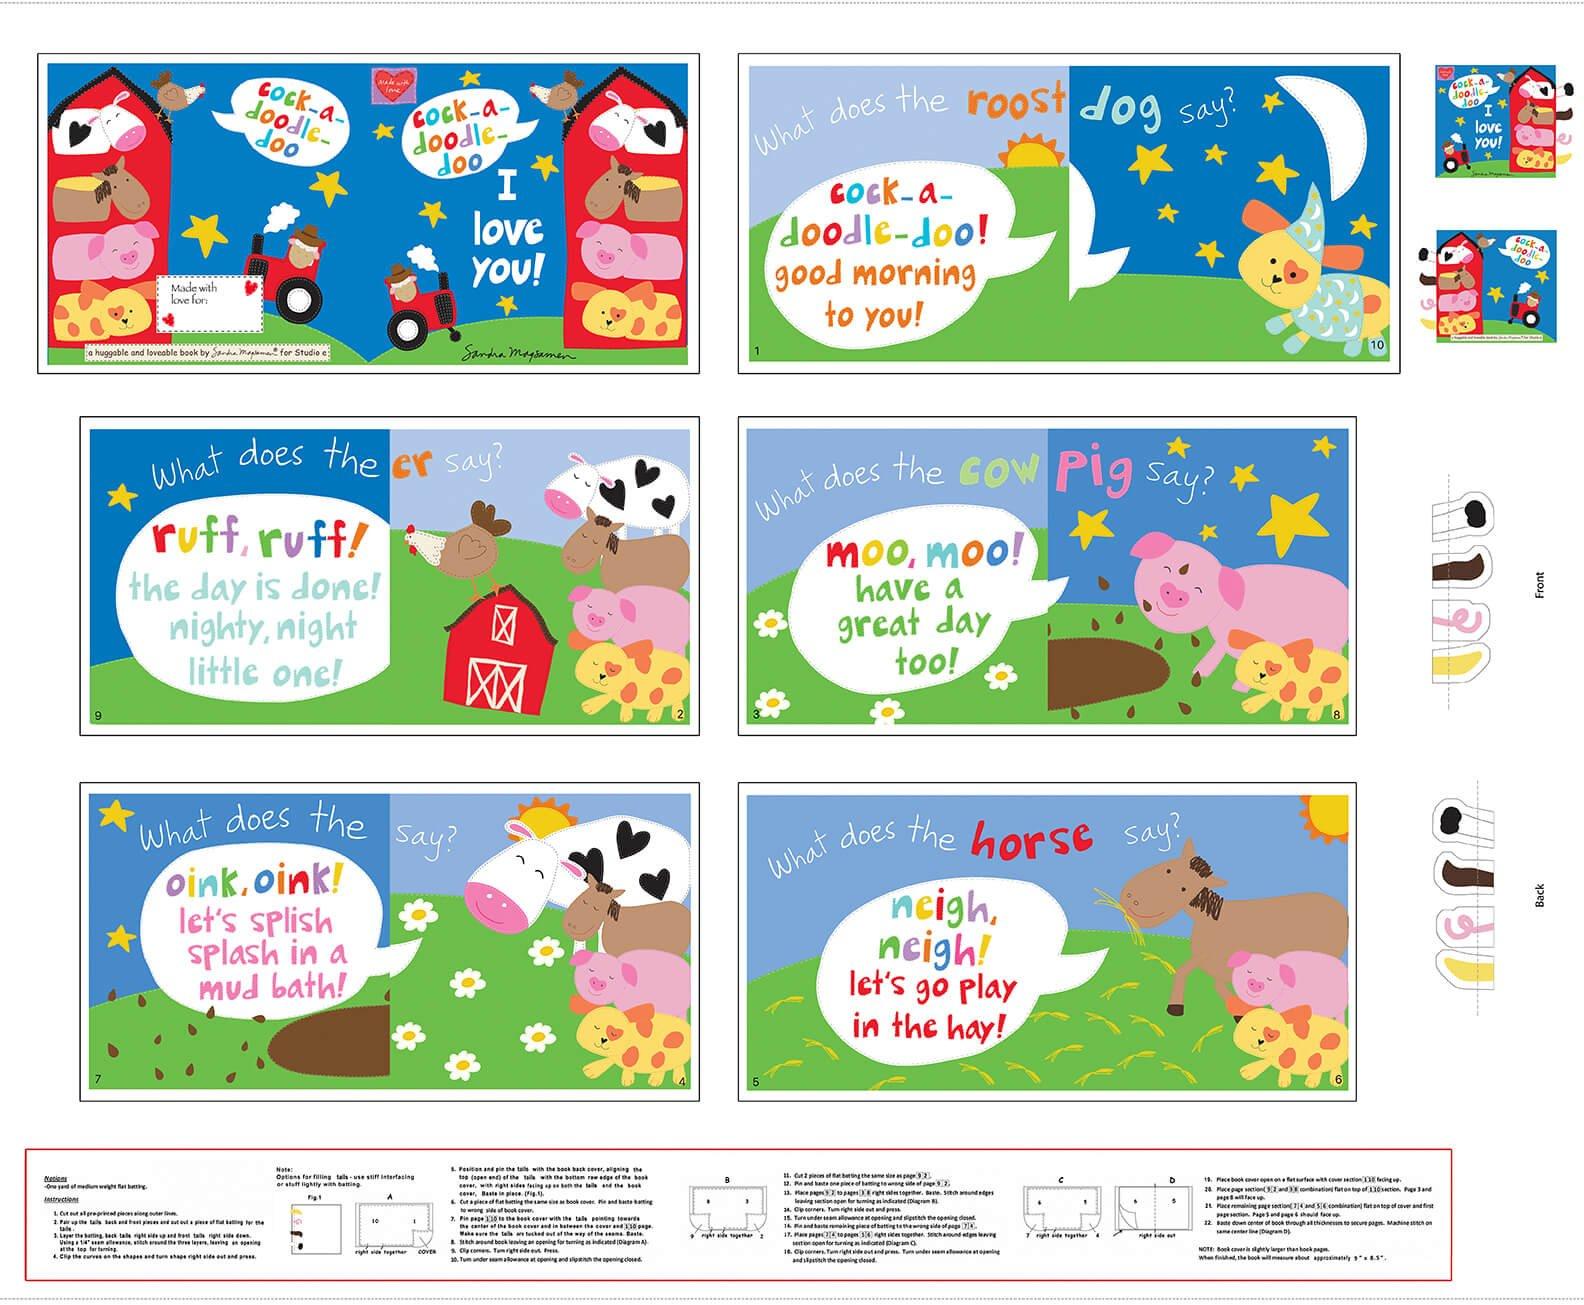 5531P-1 - Studio E Huggable & Loveable IX Book Panel - Farm